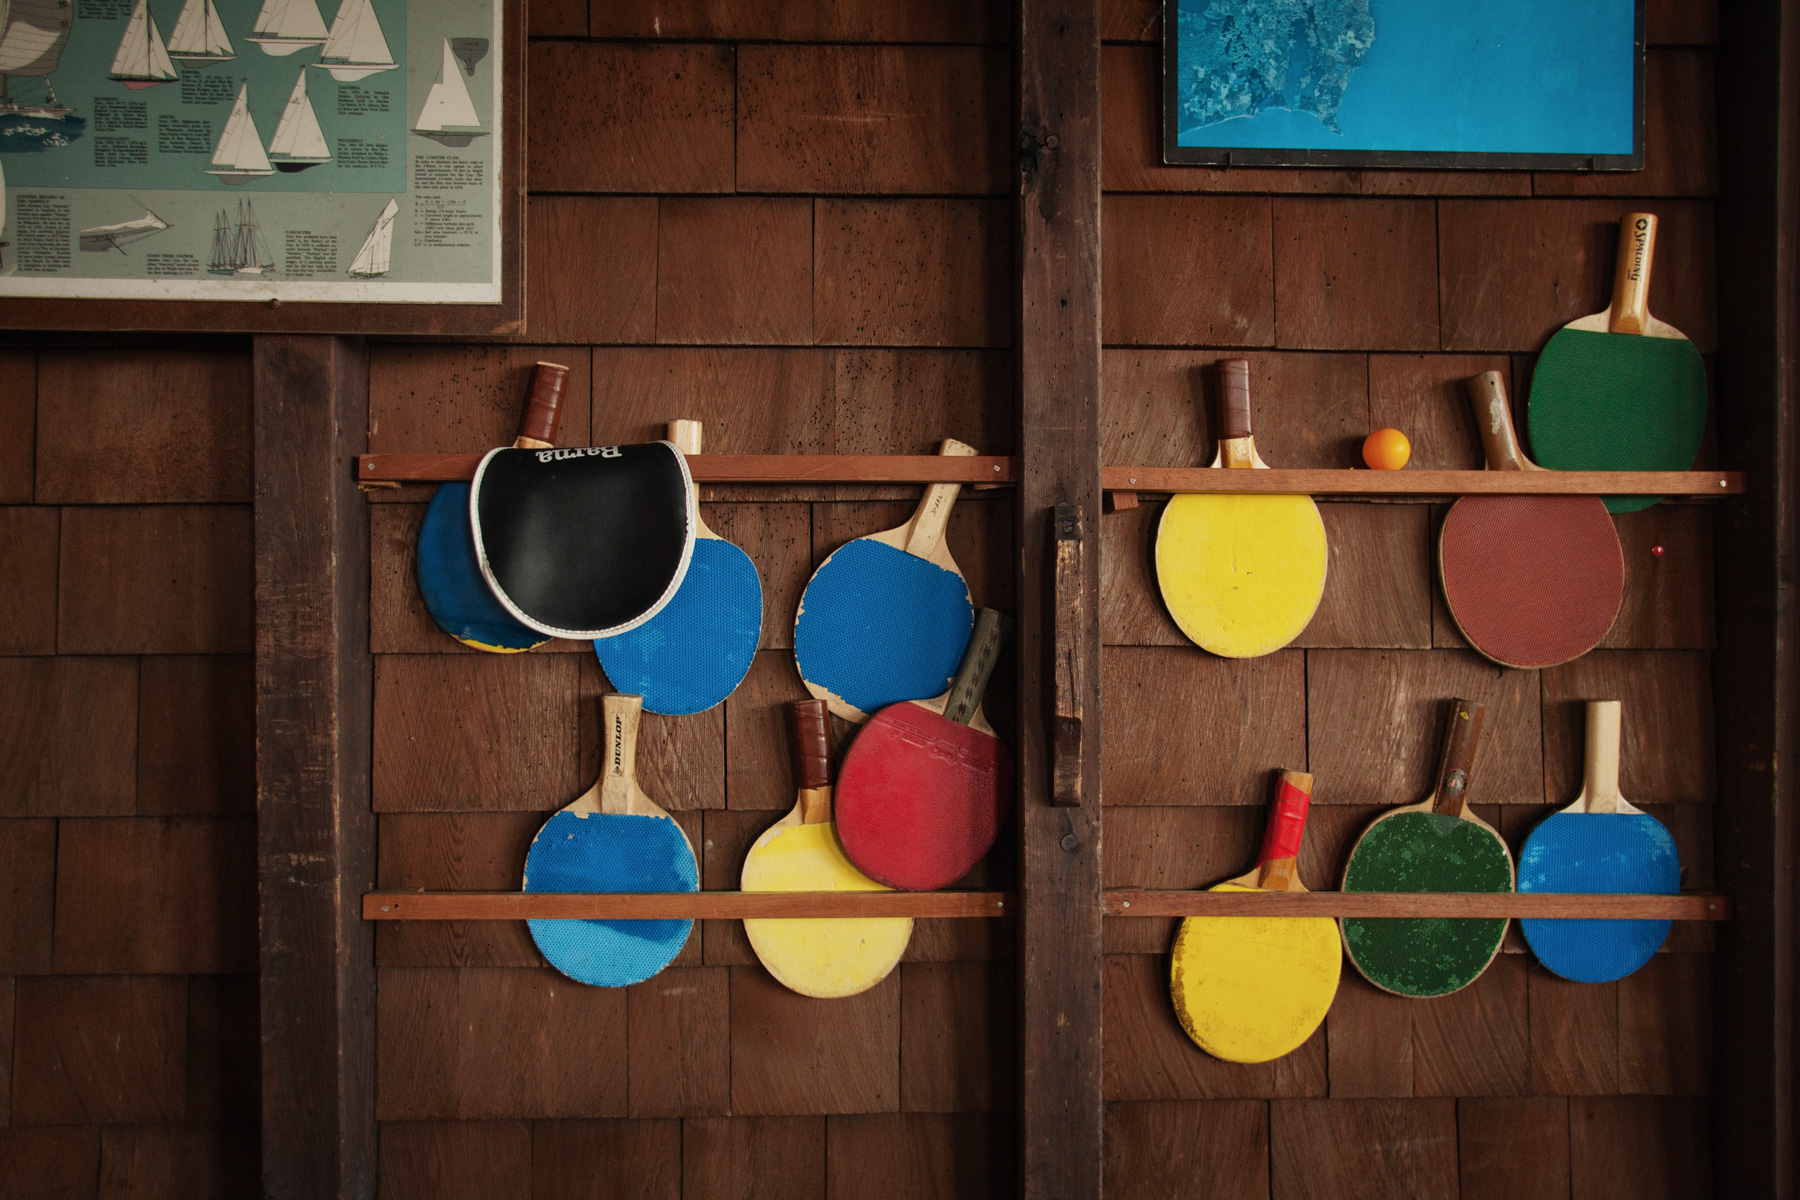 pingpong-paddle-color-1.jpg